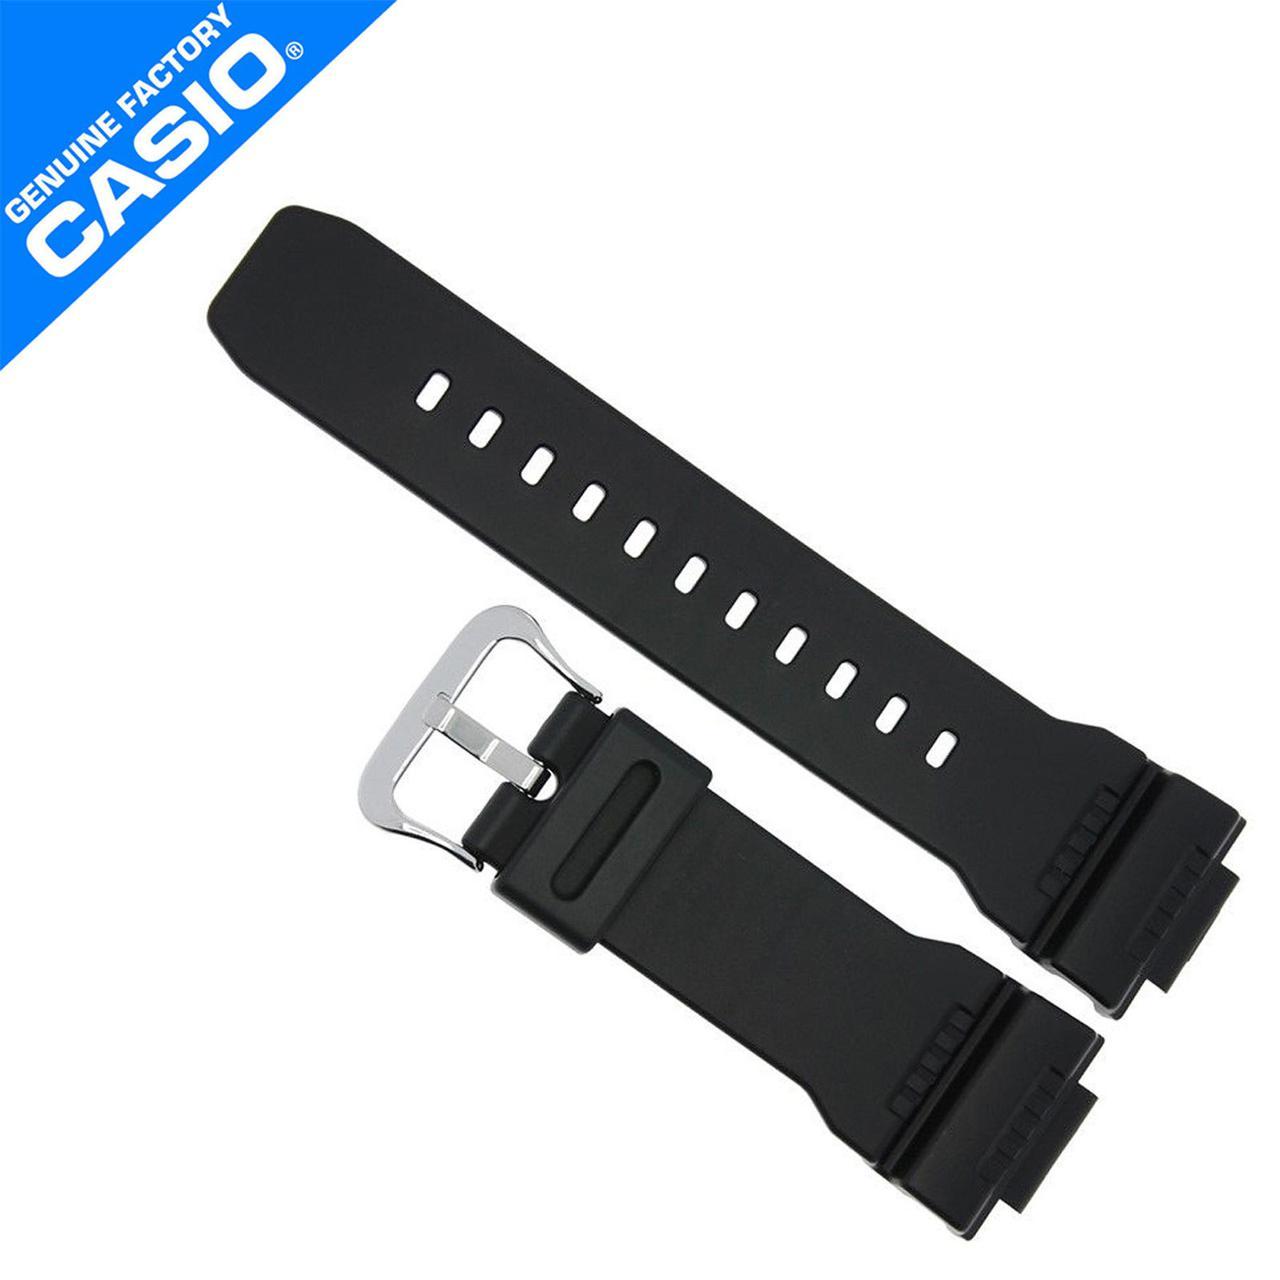 Ремешок к часам Casio G-Shock G-7900, GW-7900, GW-7900B (оригинал)